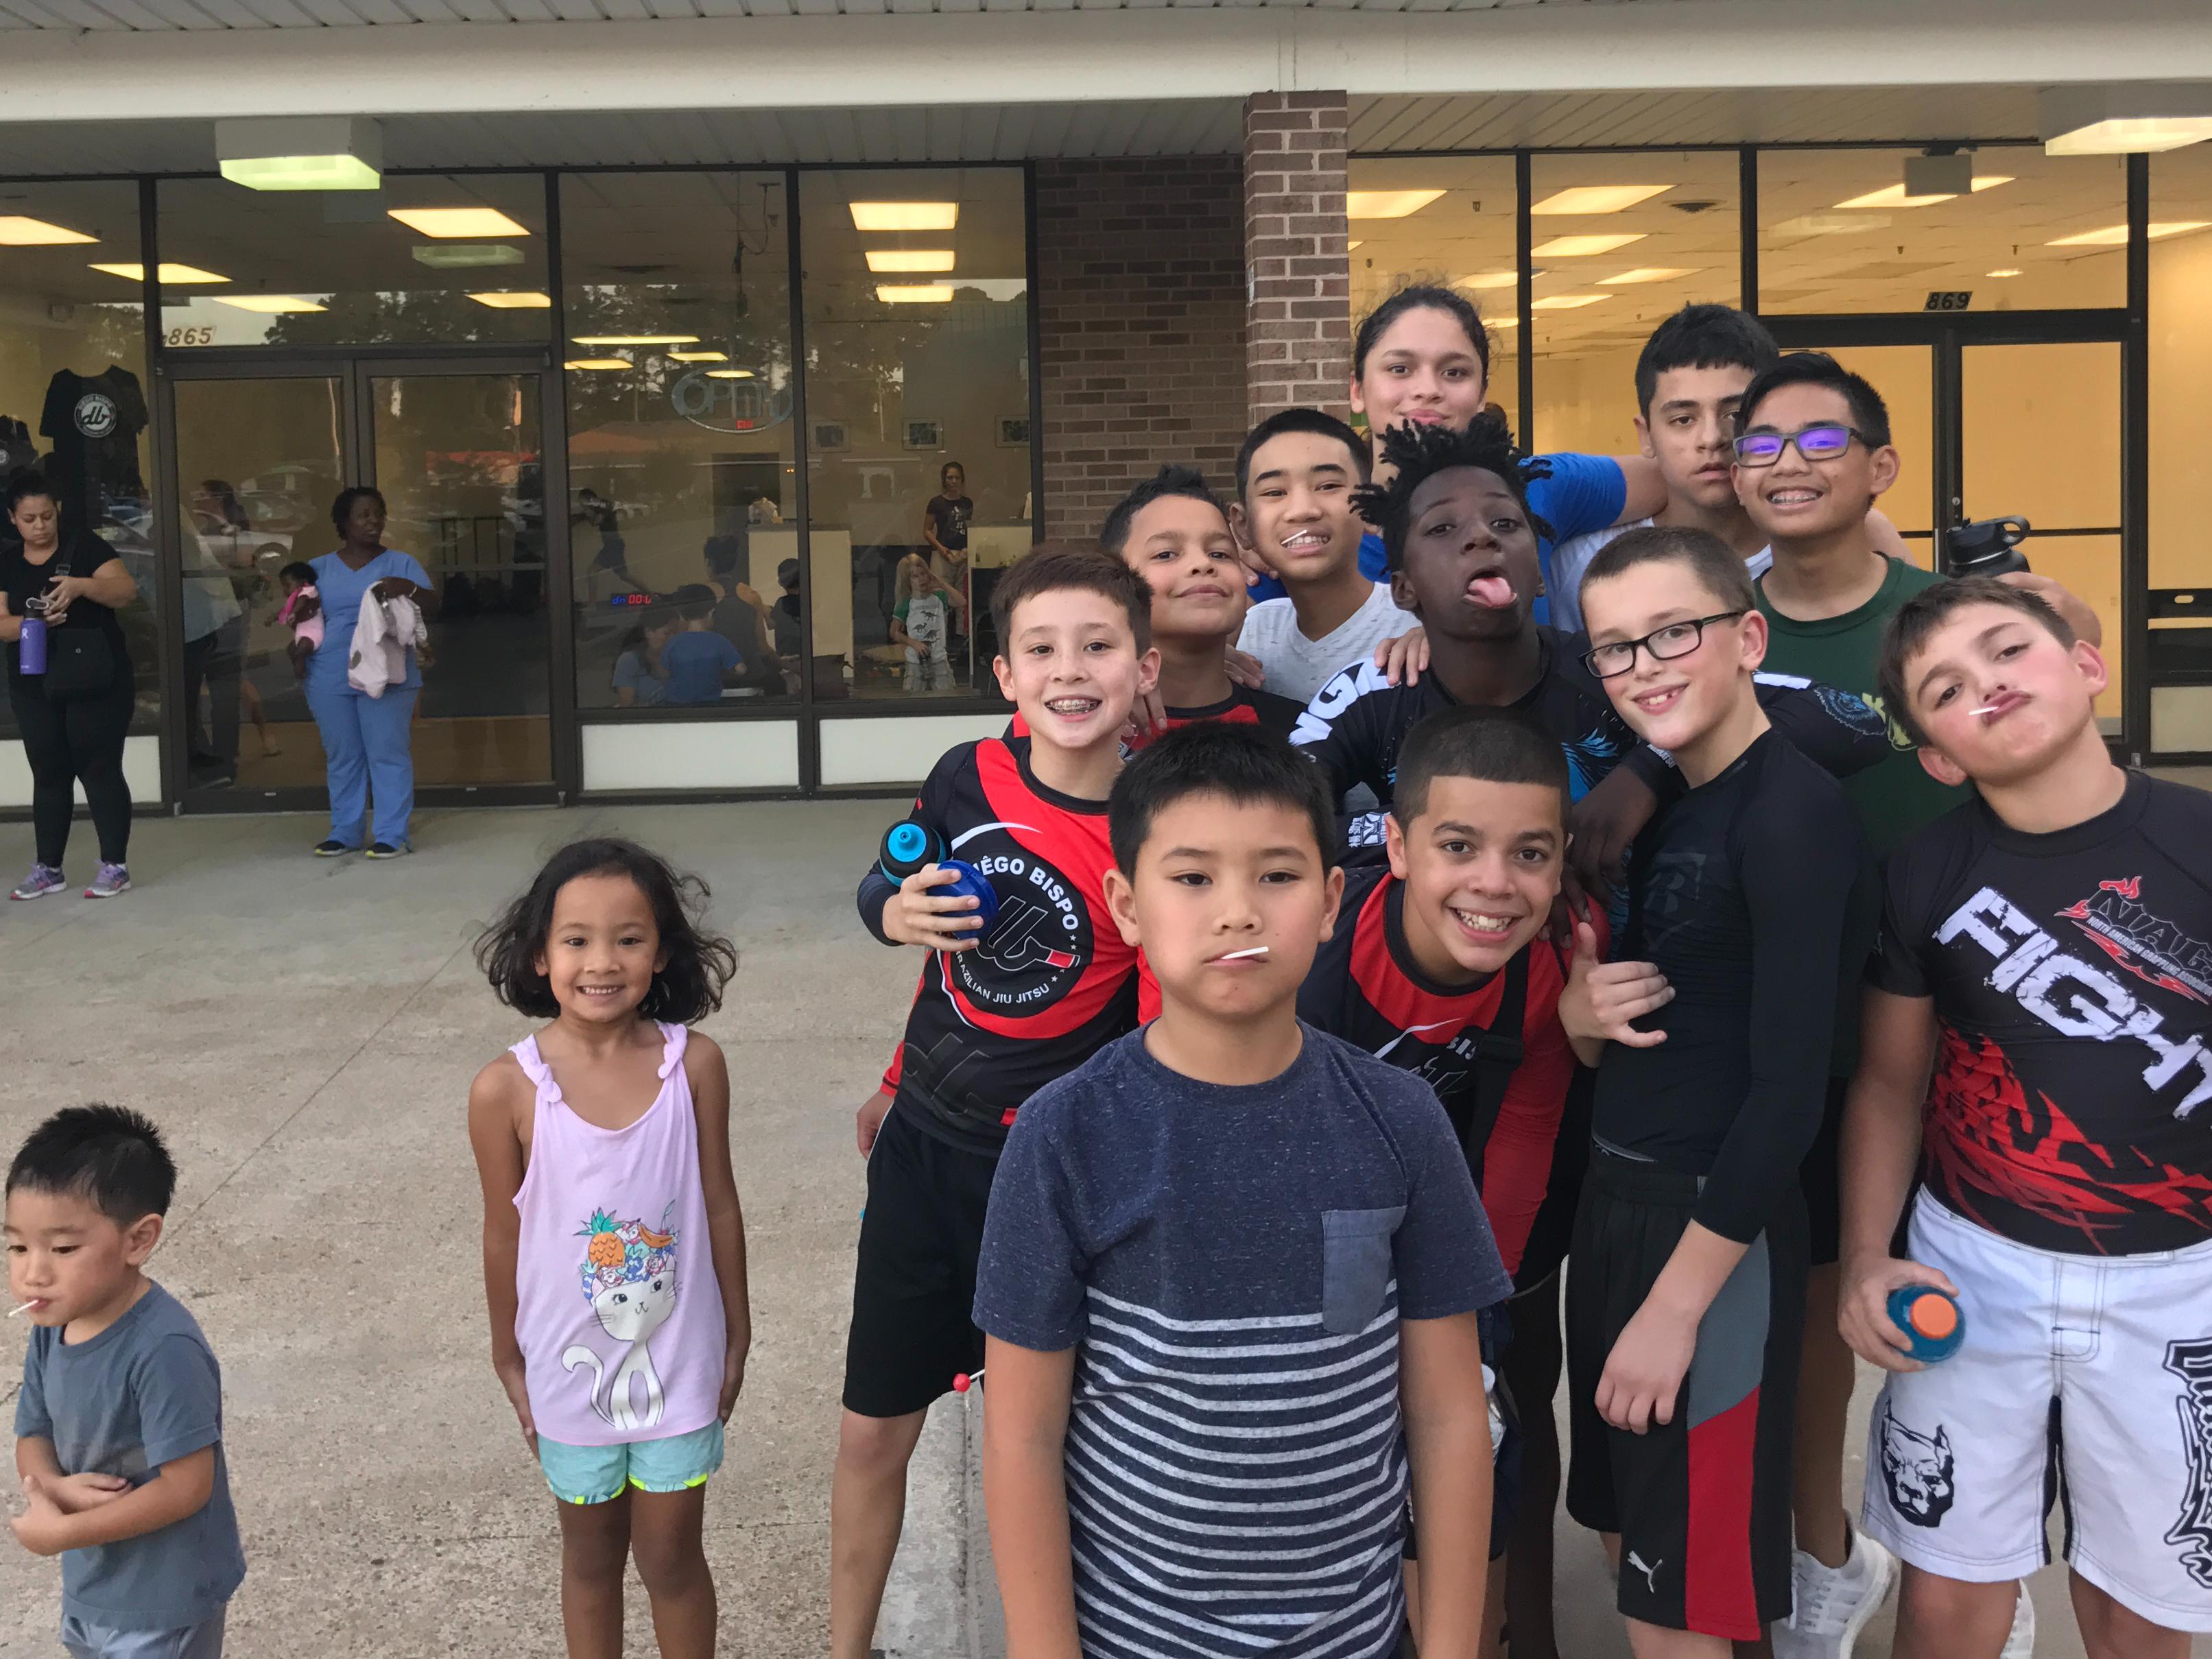 Our Kids Jiu Jitsu Fundraiser